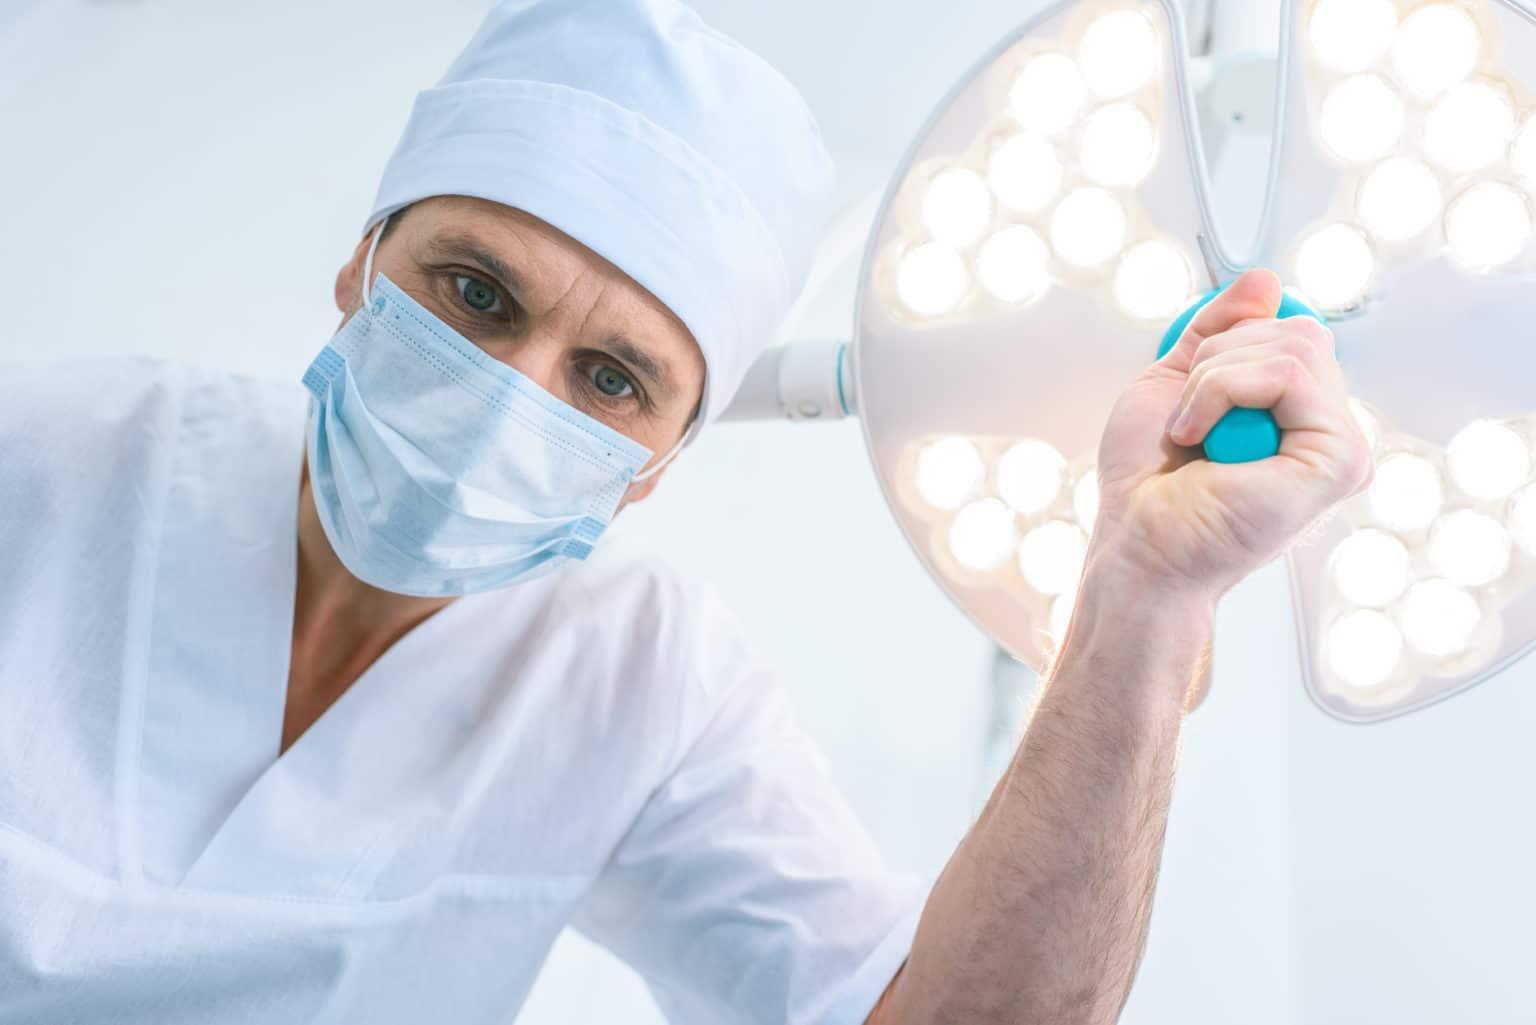 under operation gynekomasti